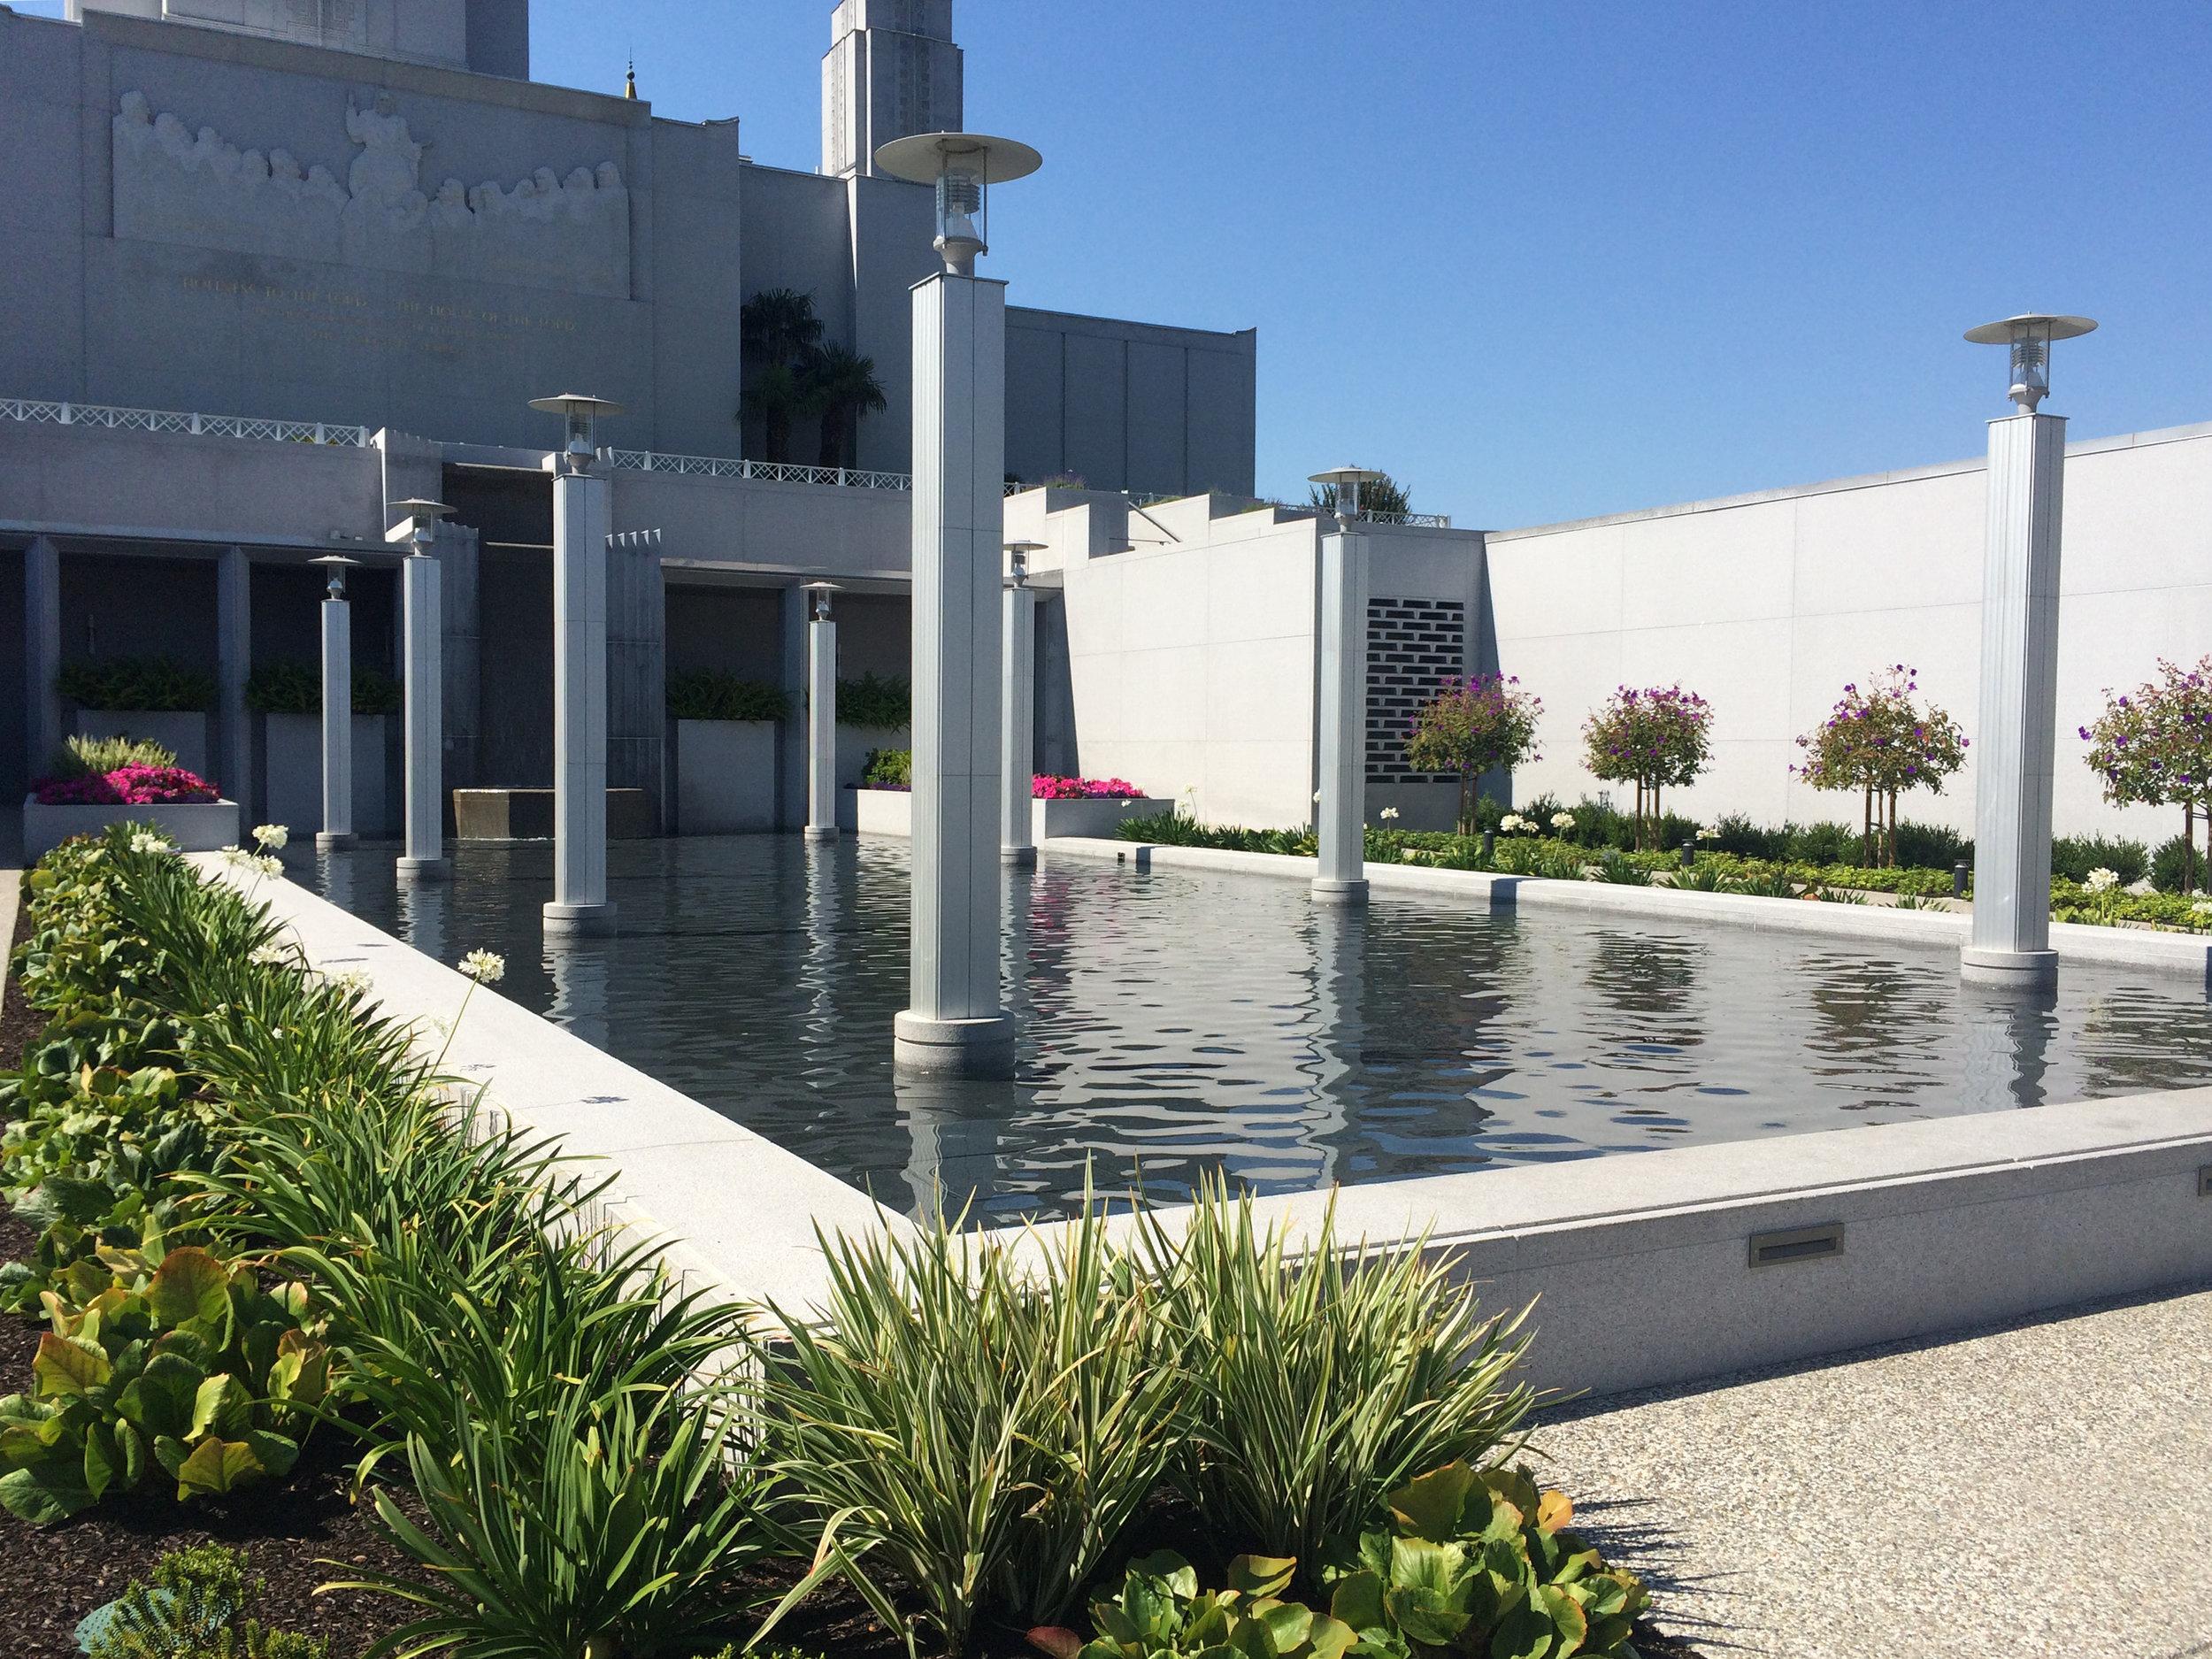 Oakland LDS Temple